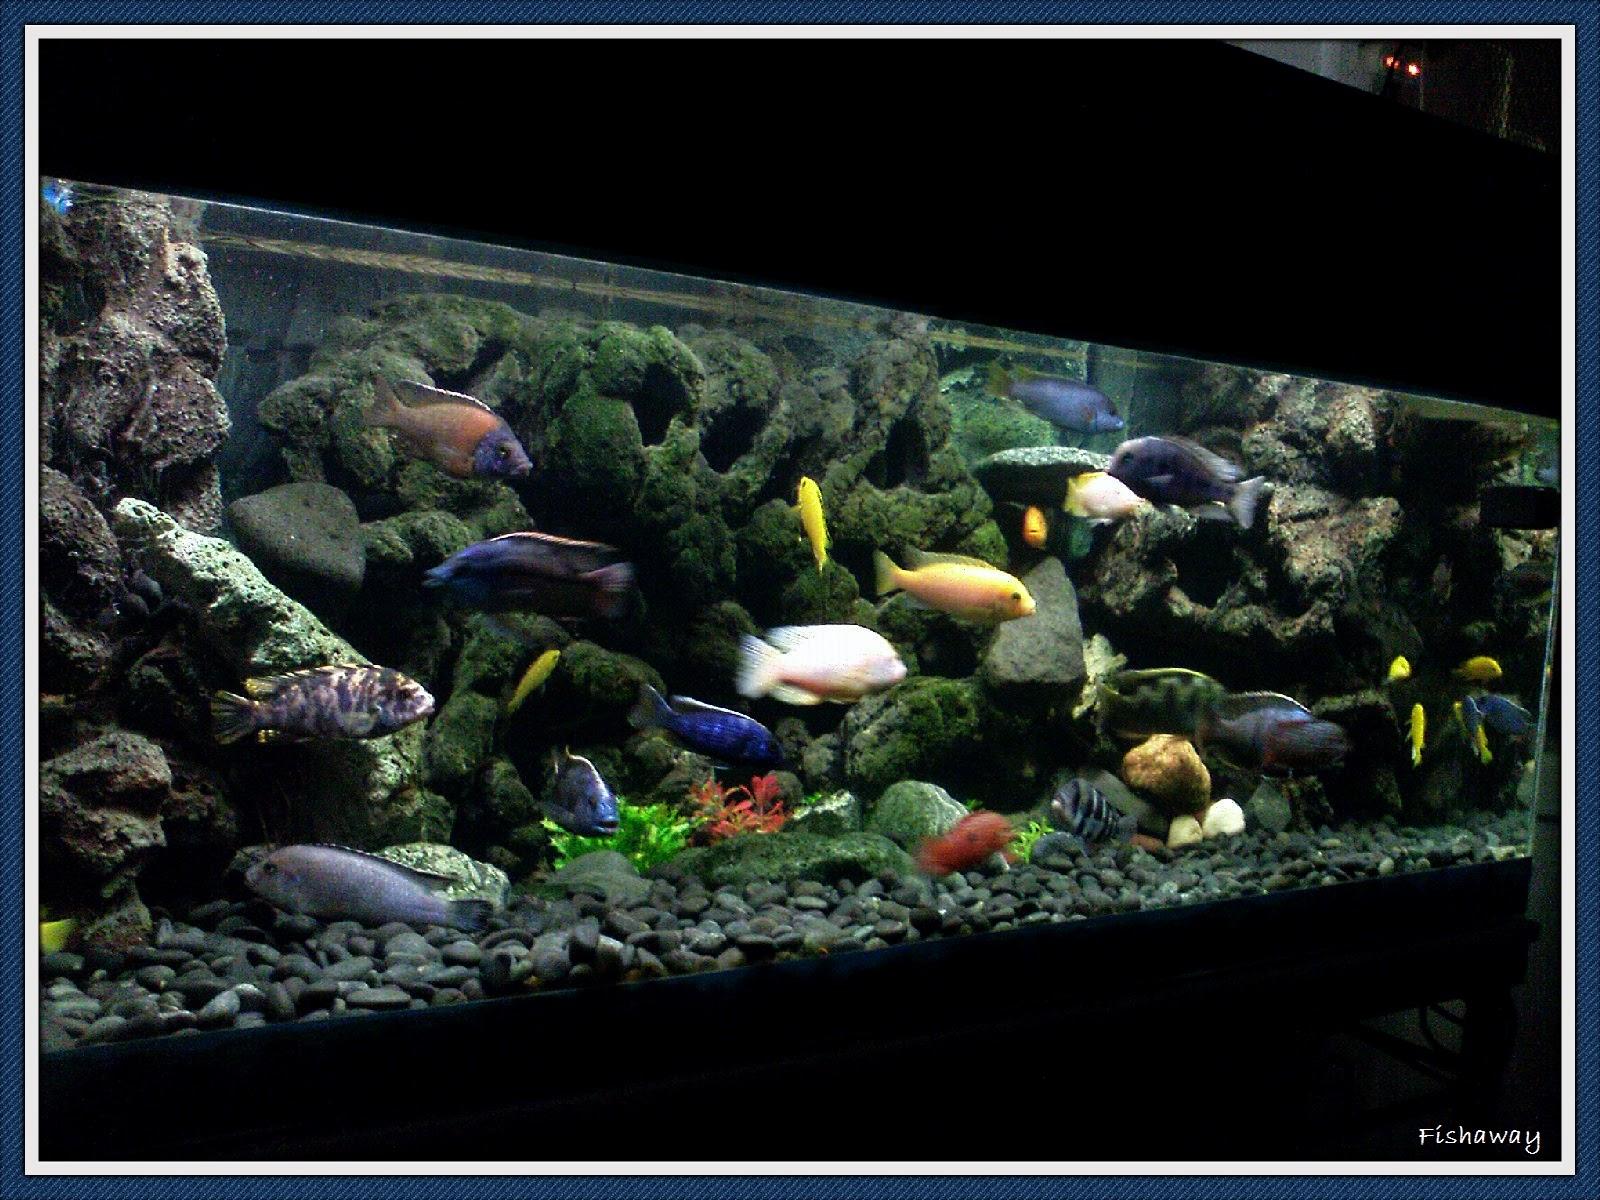 Fishaway aquarists cichlid aquarium keeping for Black sand fish tank